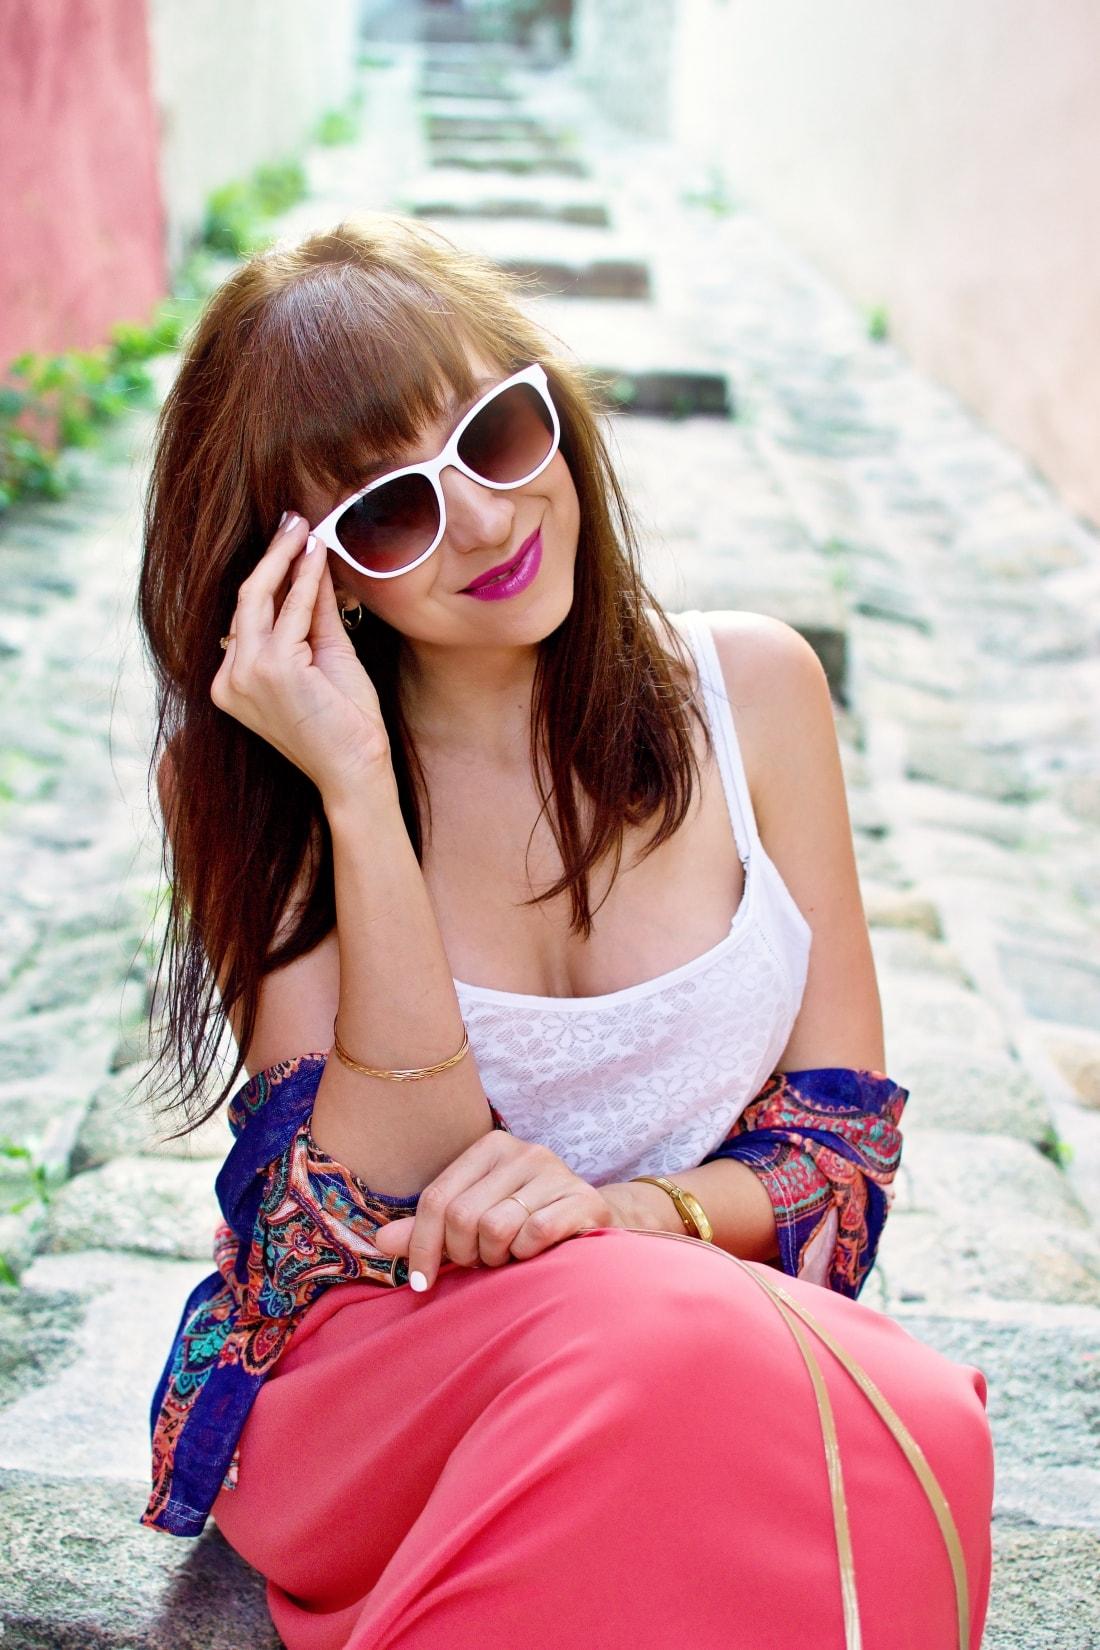 Purse jewel_Katharine fashion is beautiful blog 7_Mini bag_Kimono_Maxi_Handmade_Gold_Katarína Jakubčová_Fashion blogger